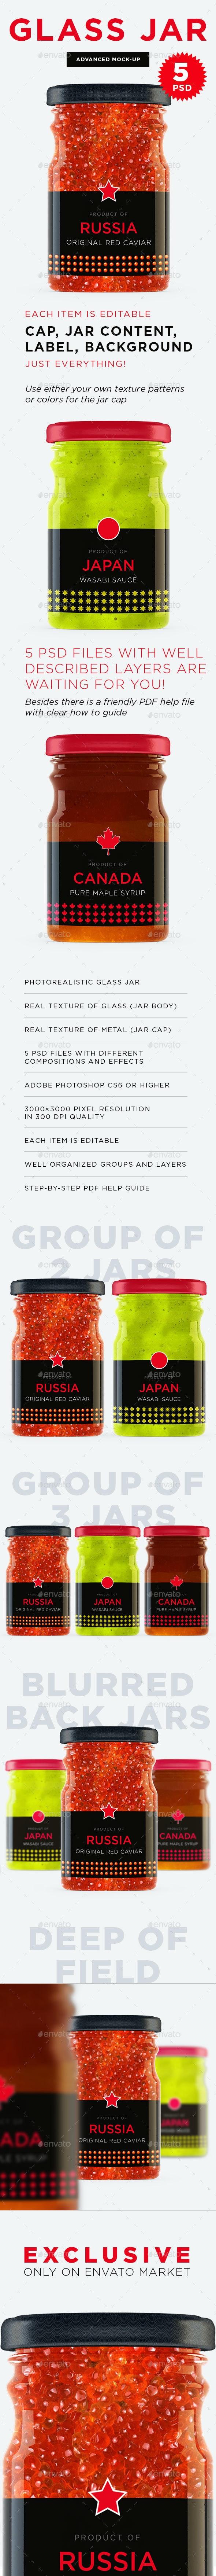 Glass Jar Mockup - Food and Drink Packaging